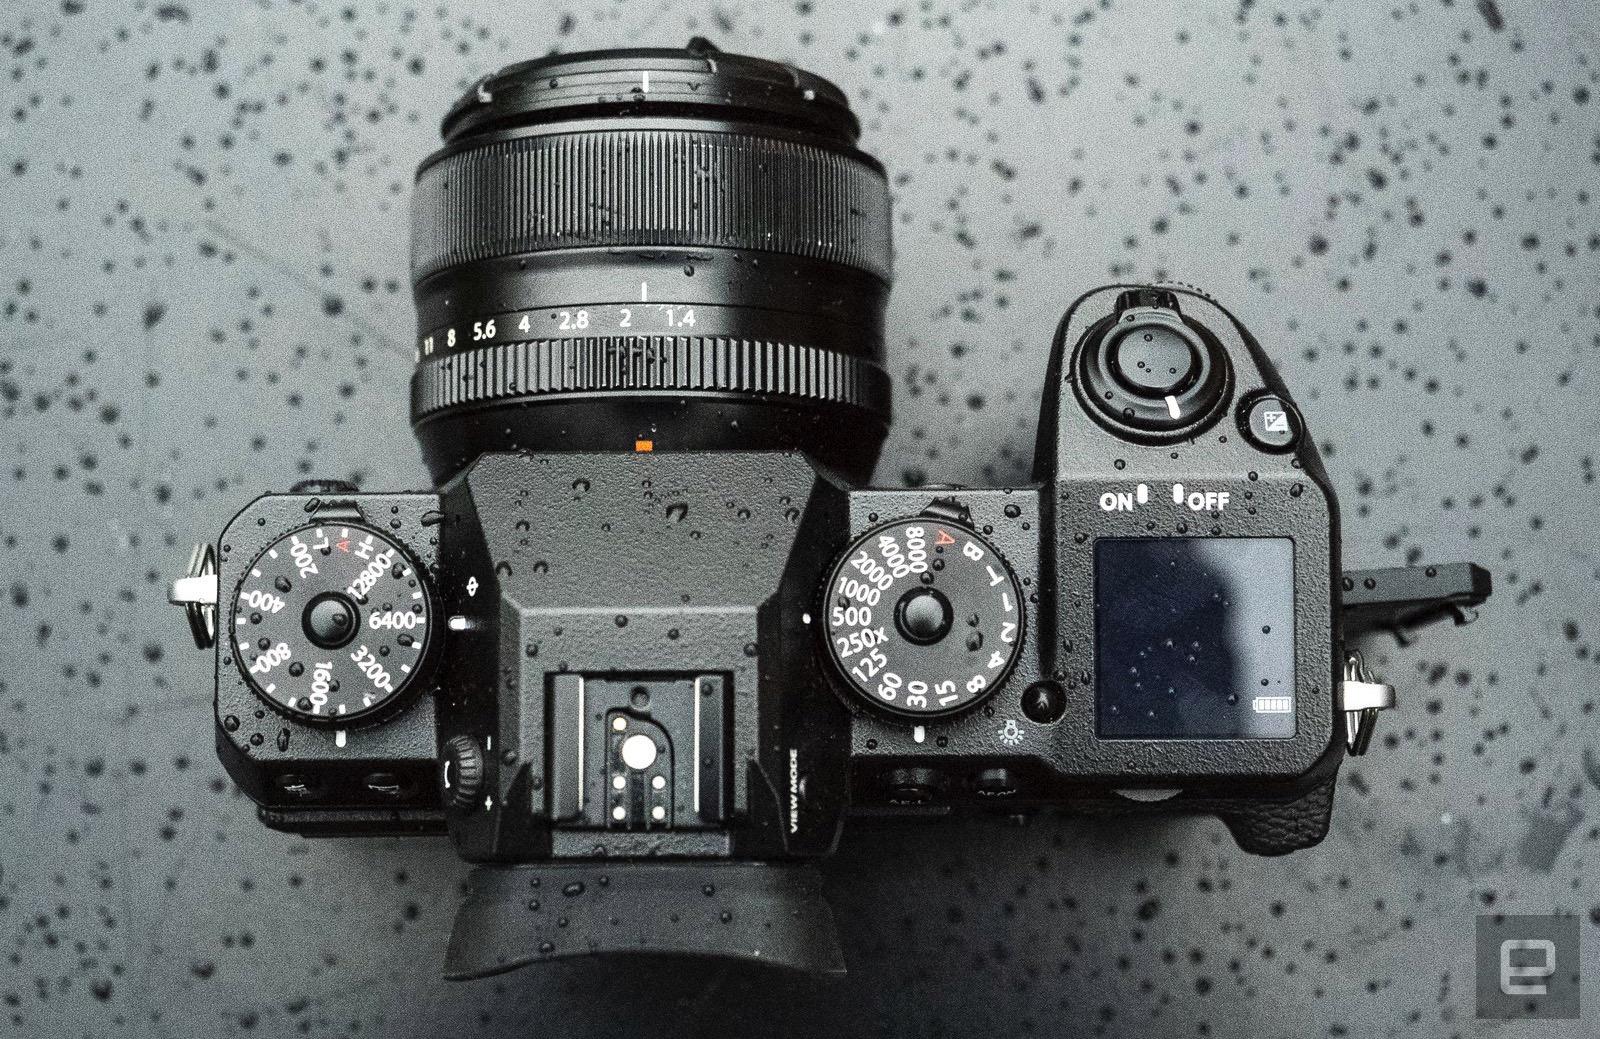 Fujifilm XH-1 review: Beautiful photos, but lacking X-series allure